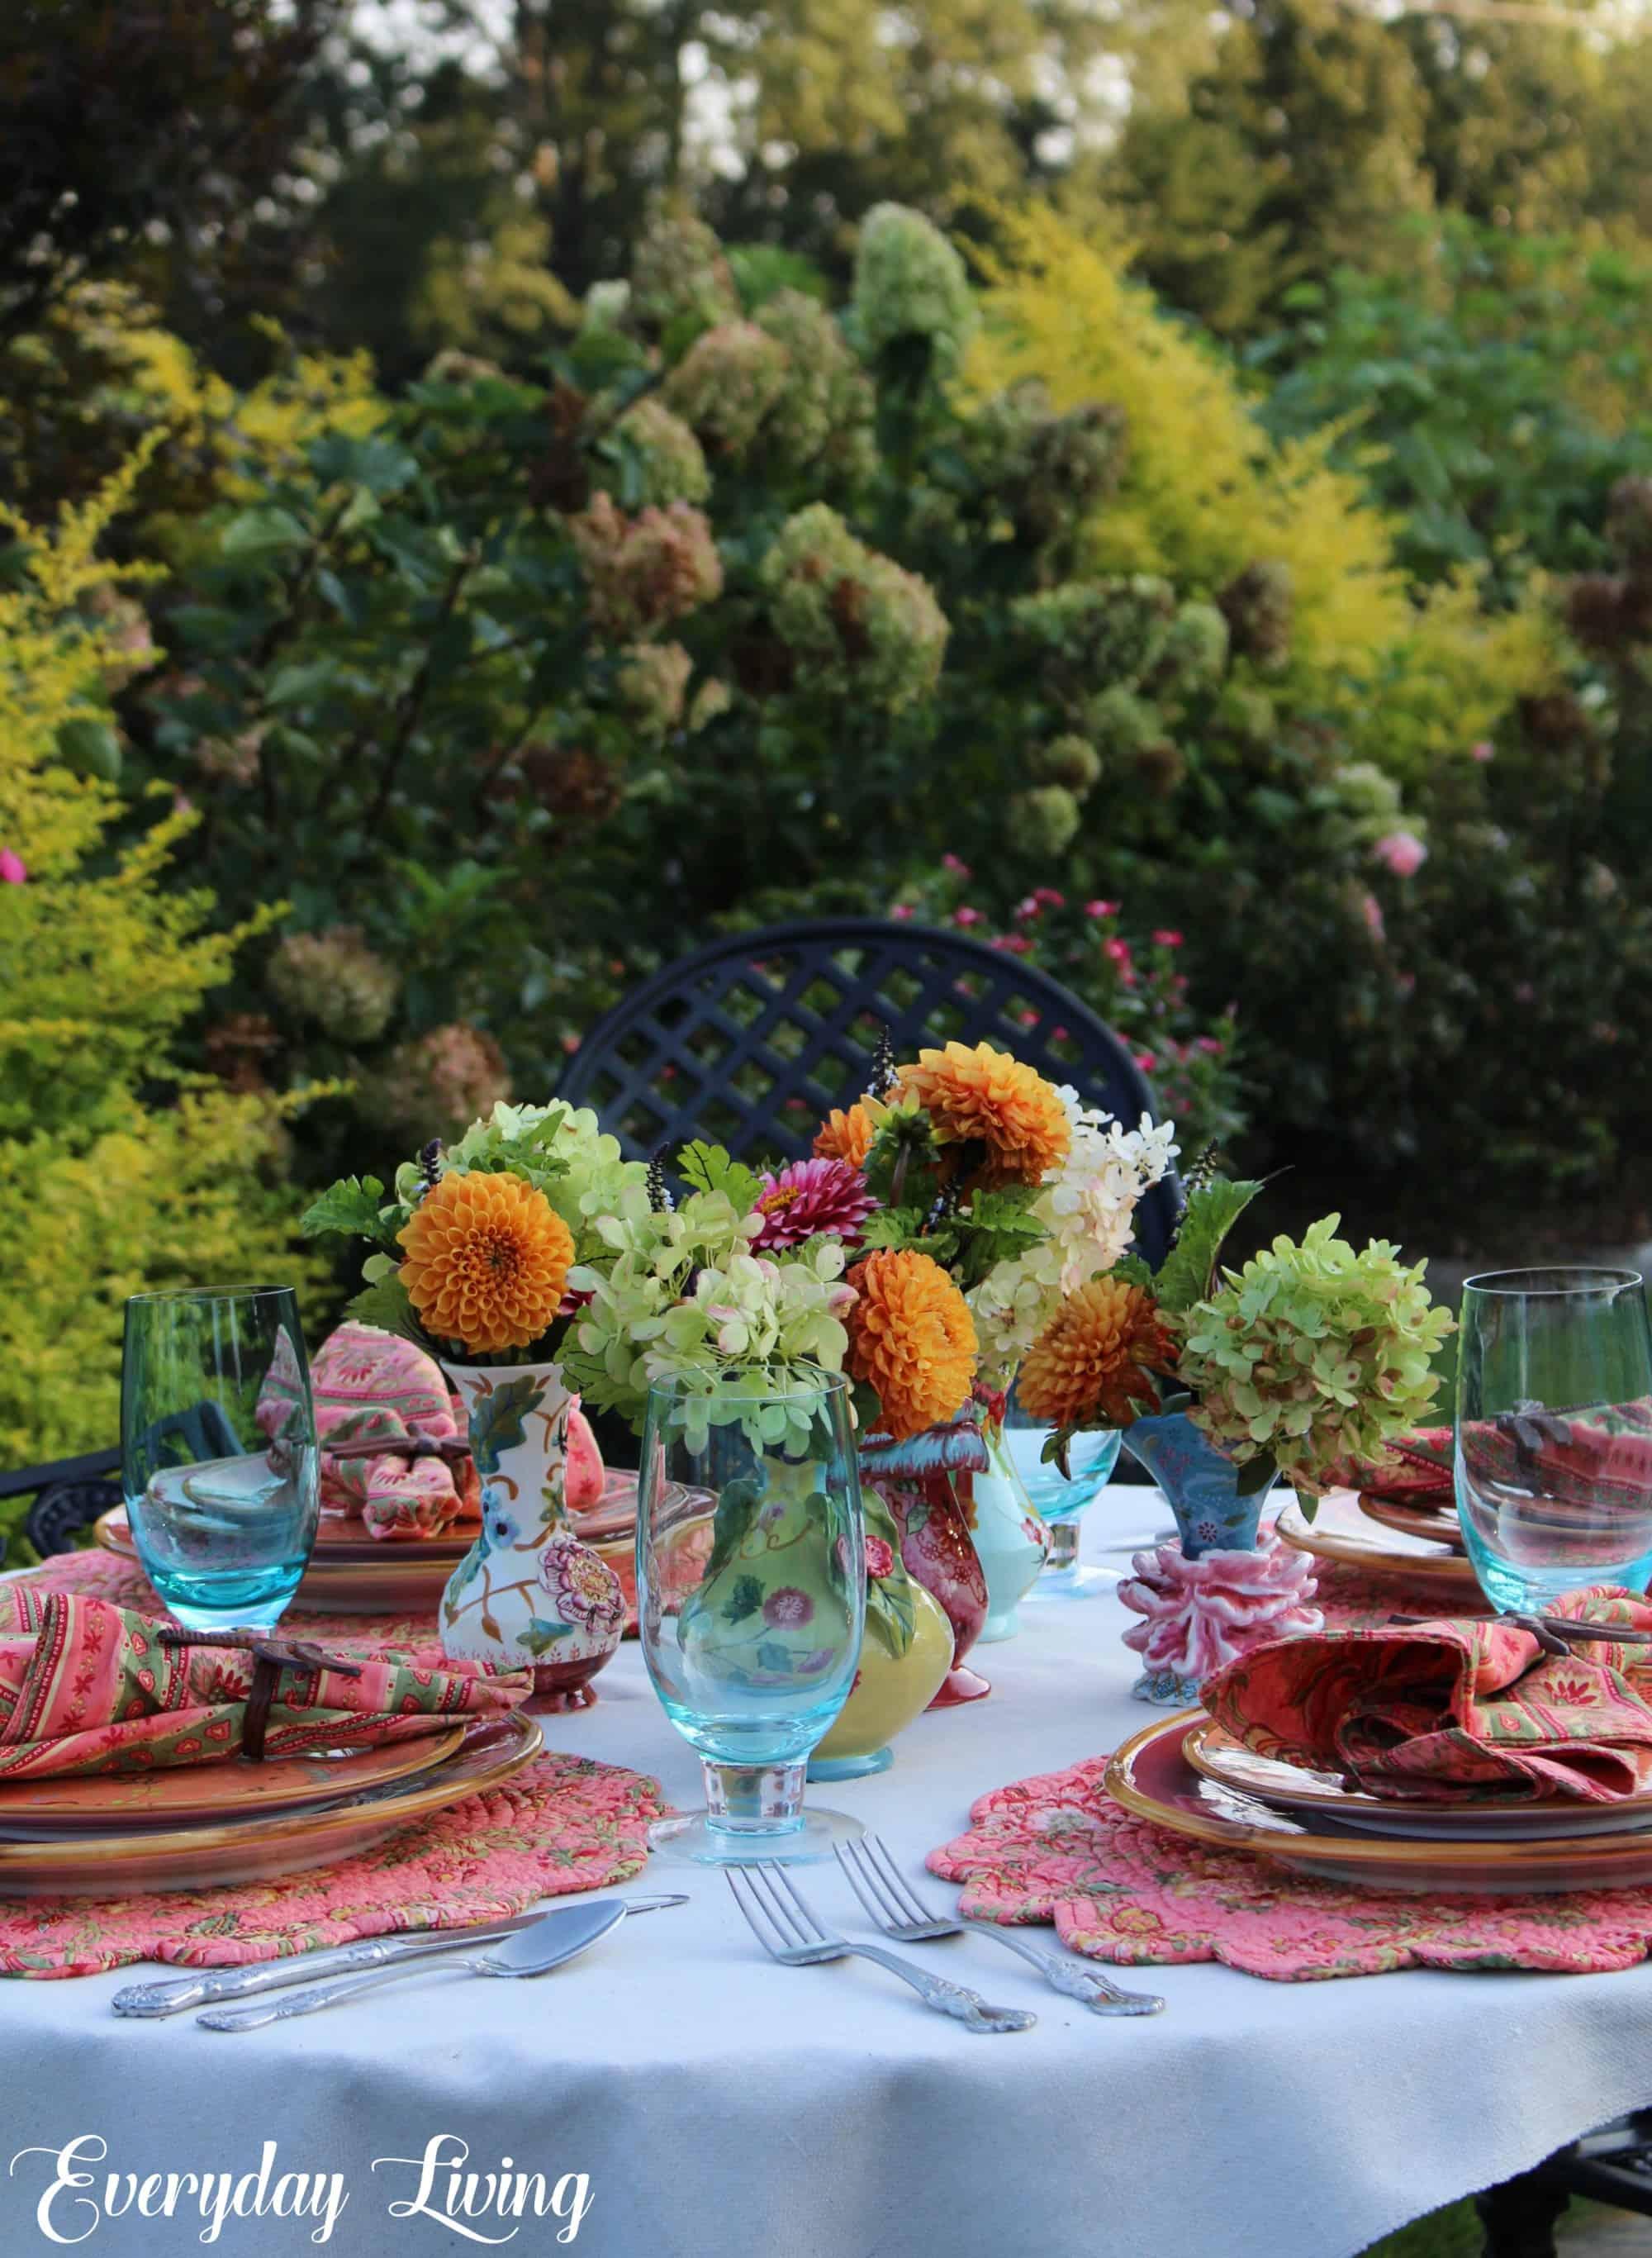 sundays at home 175 celebrating everyday life with jennifer carroll